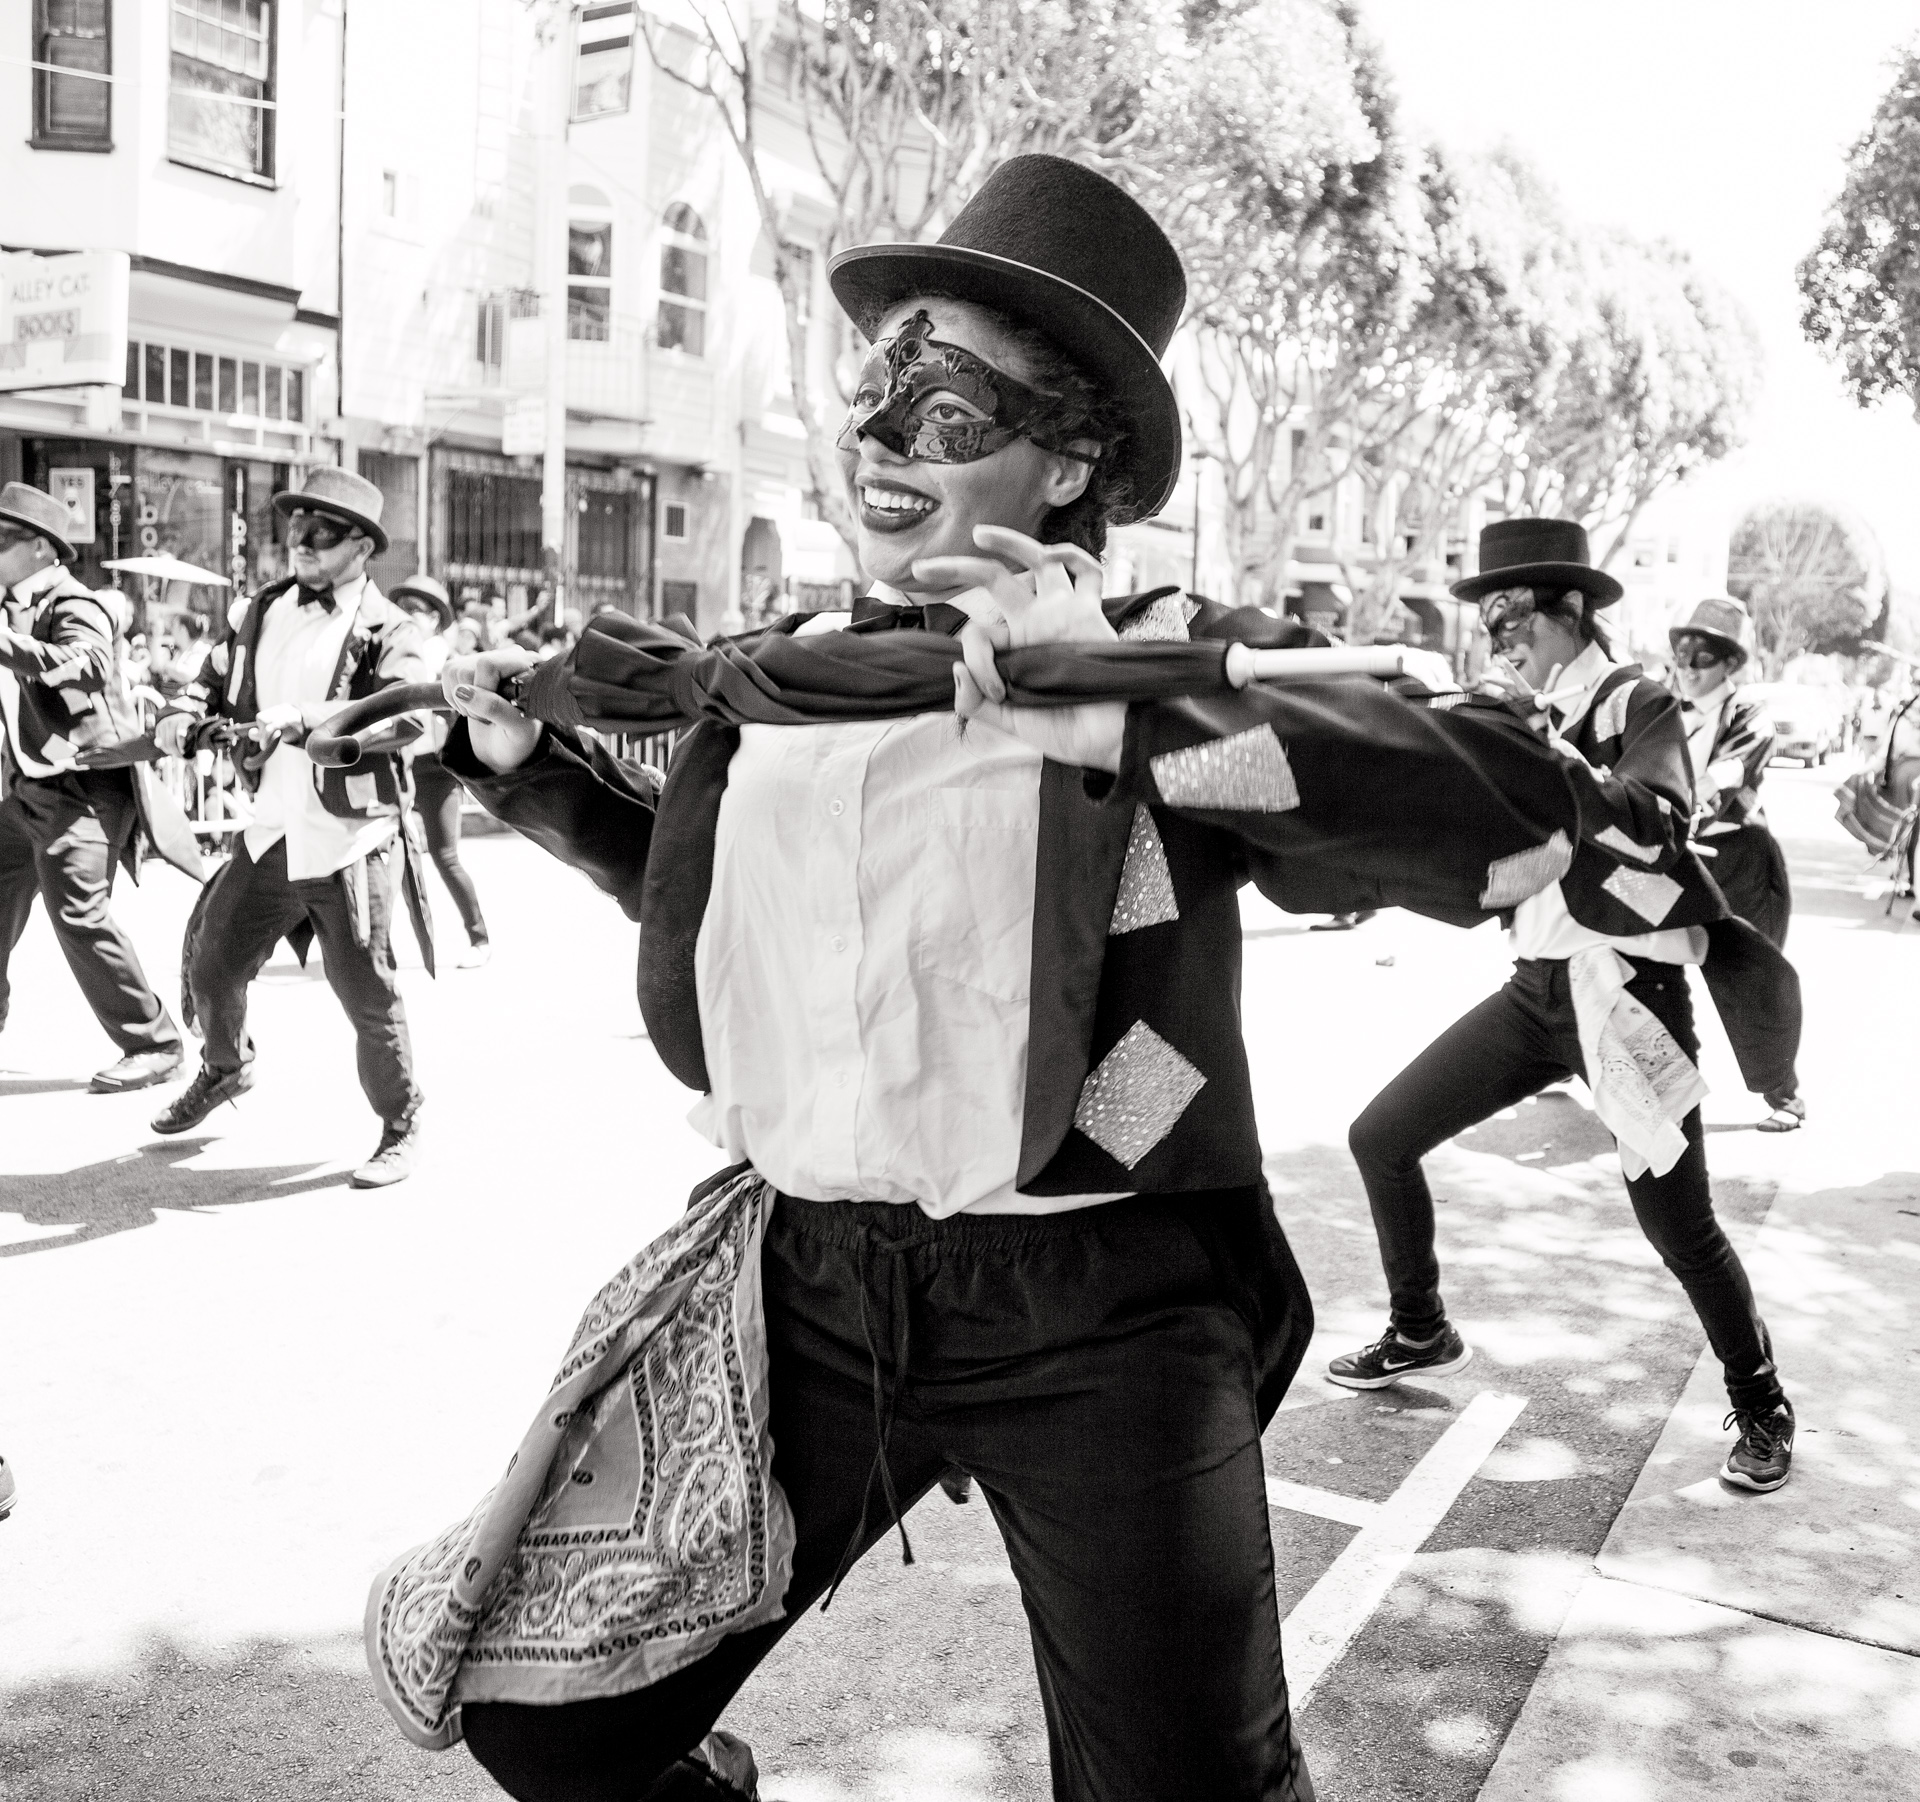 Carnaval-11.jpg